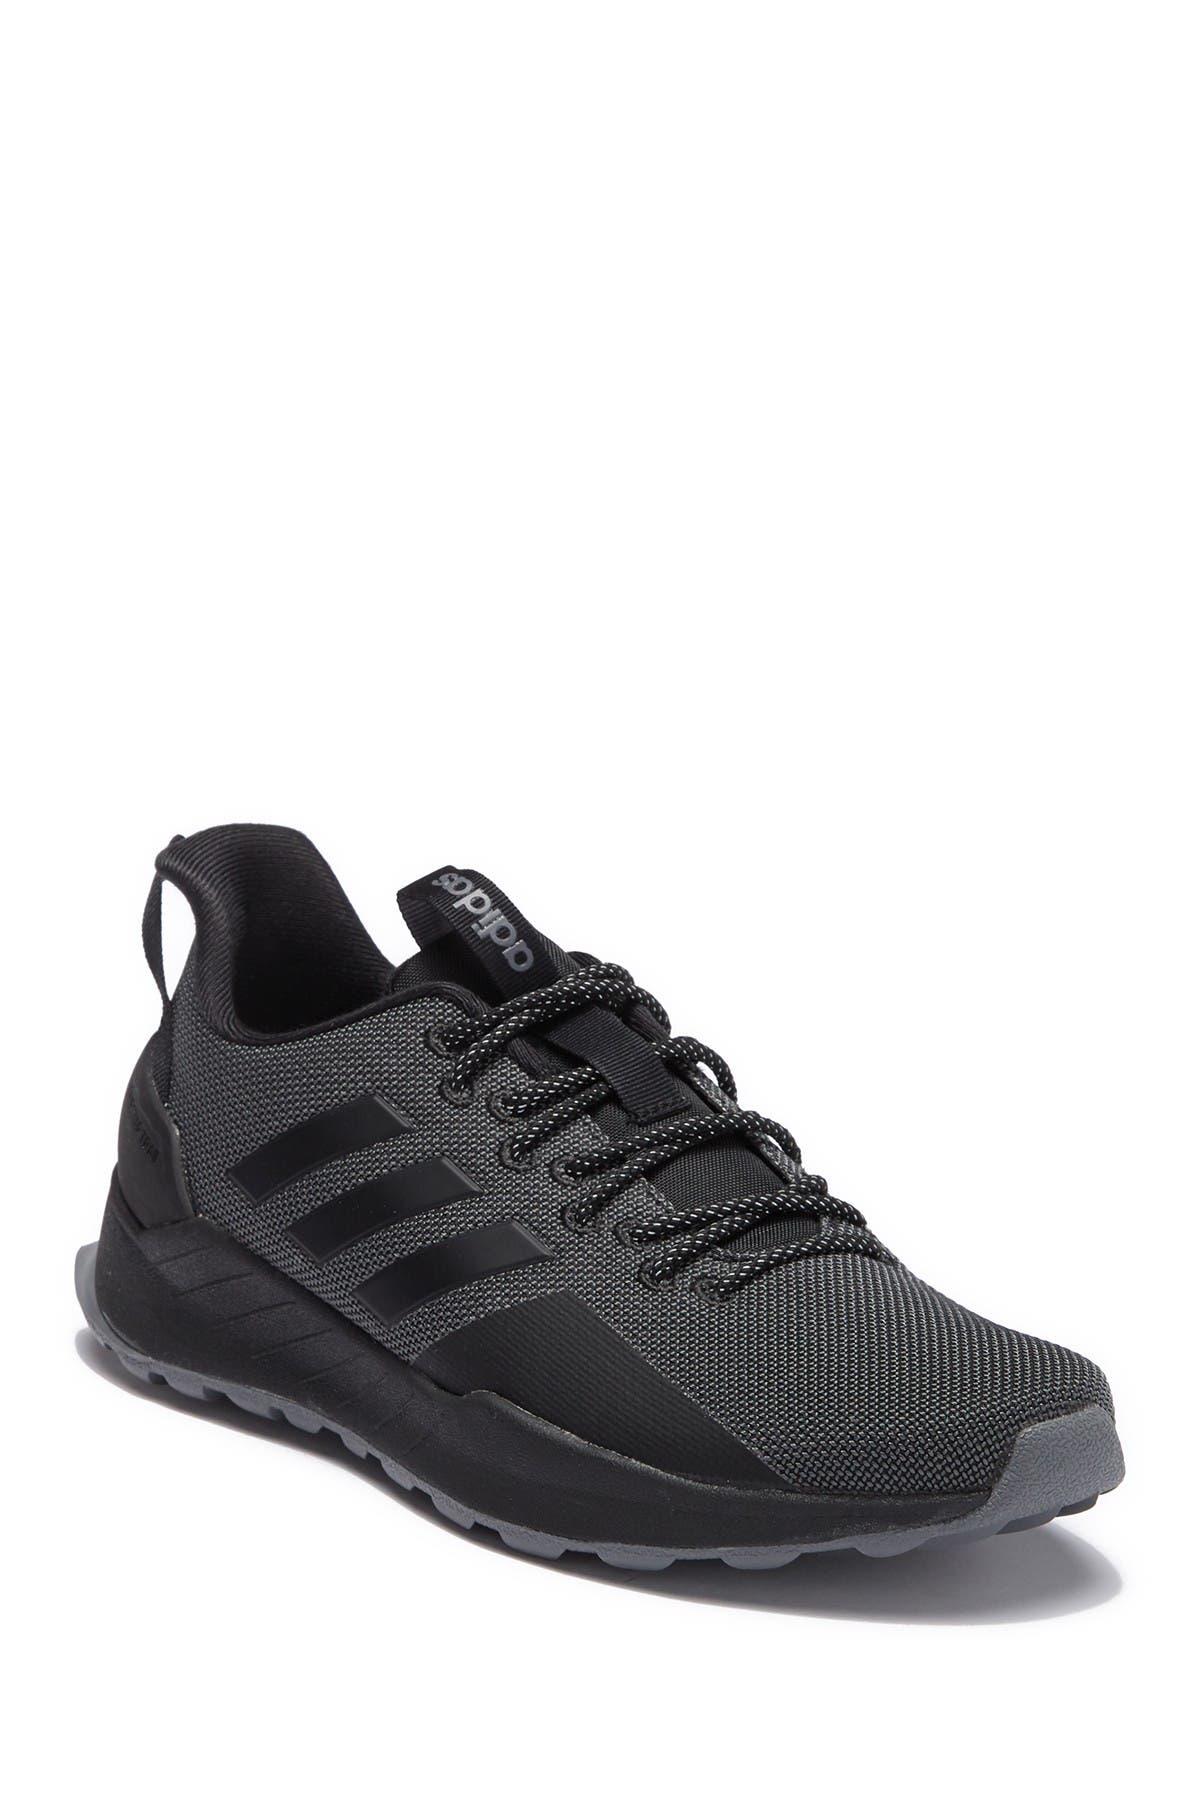 adidas   Questar Trail Running Shoe